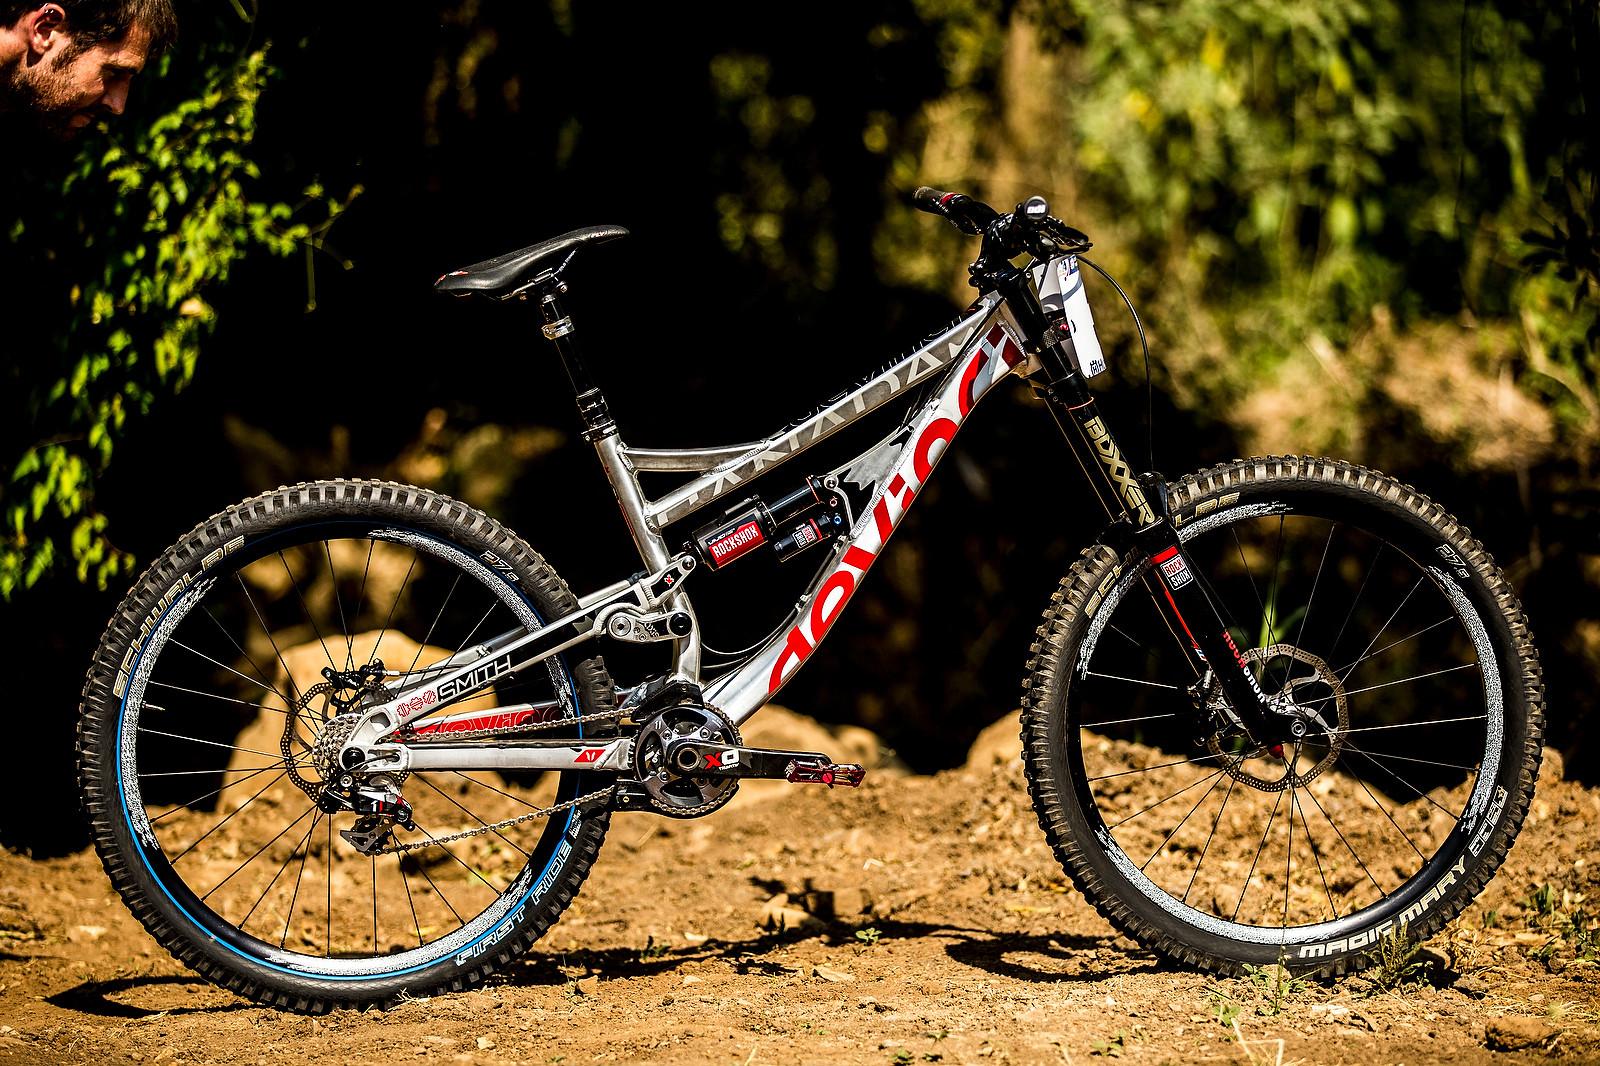 WORLD CHAMPS BIKE: Steve Smith's Custom Devinci - WORLD CHAMPS BIKE: Steve Smith's Custom Devinci - Mountain Biking Pictures - Vital MTB